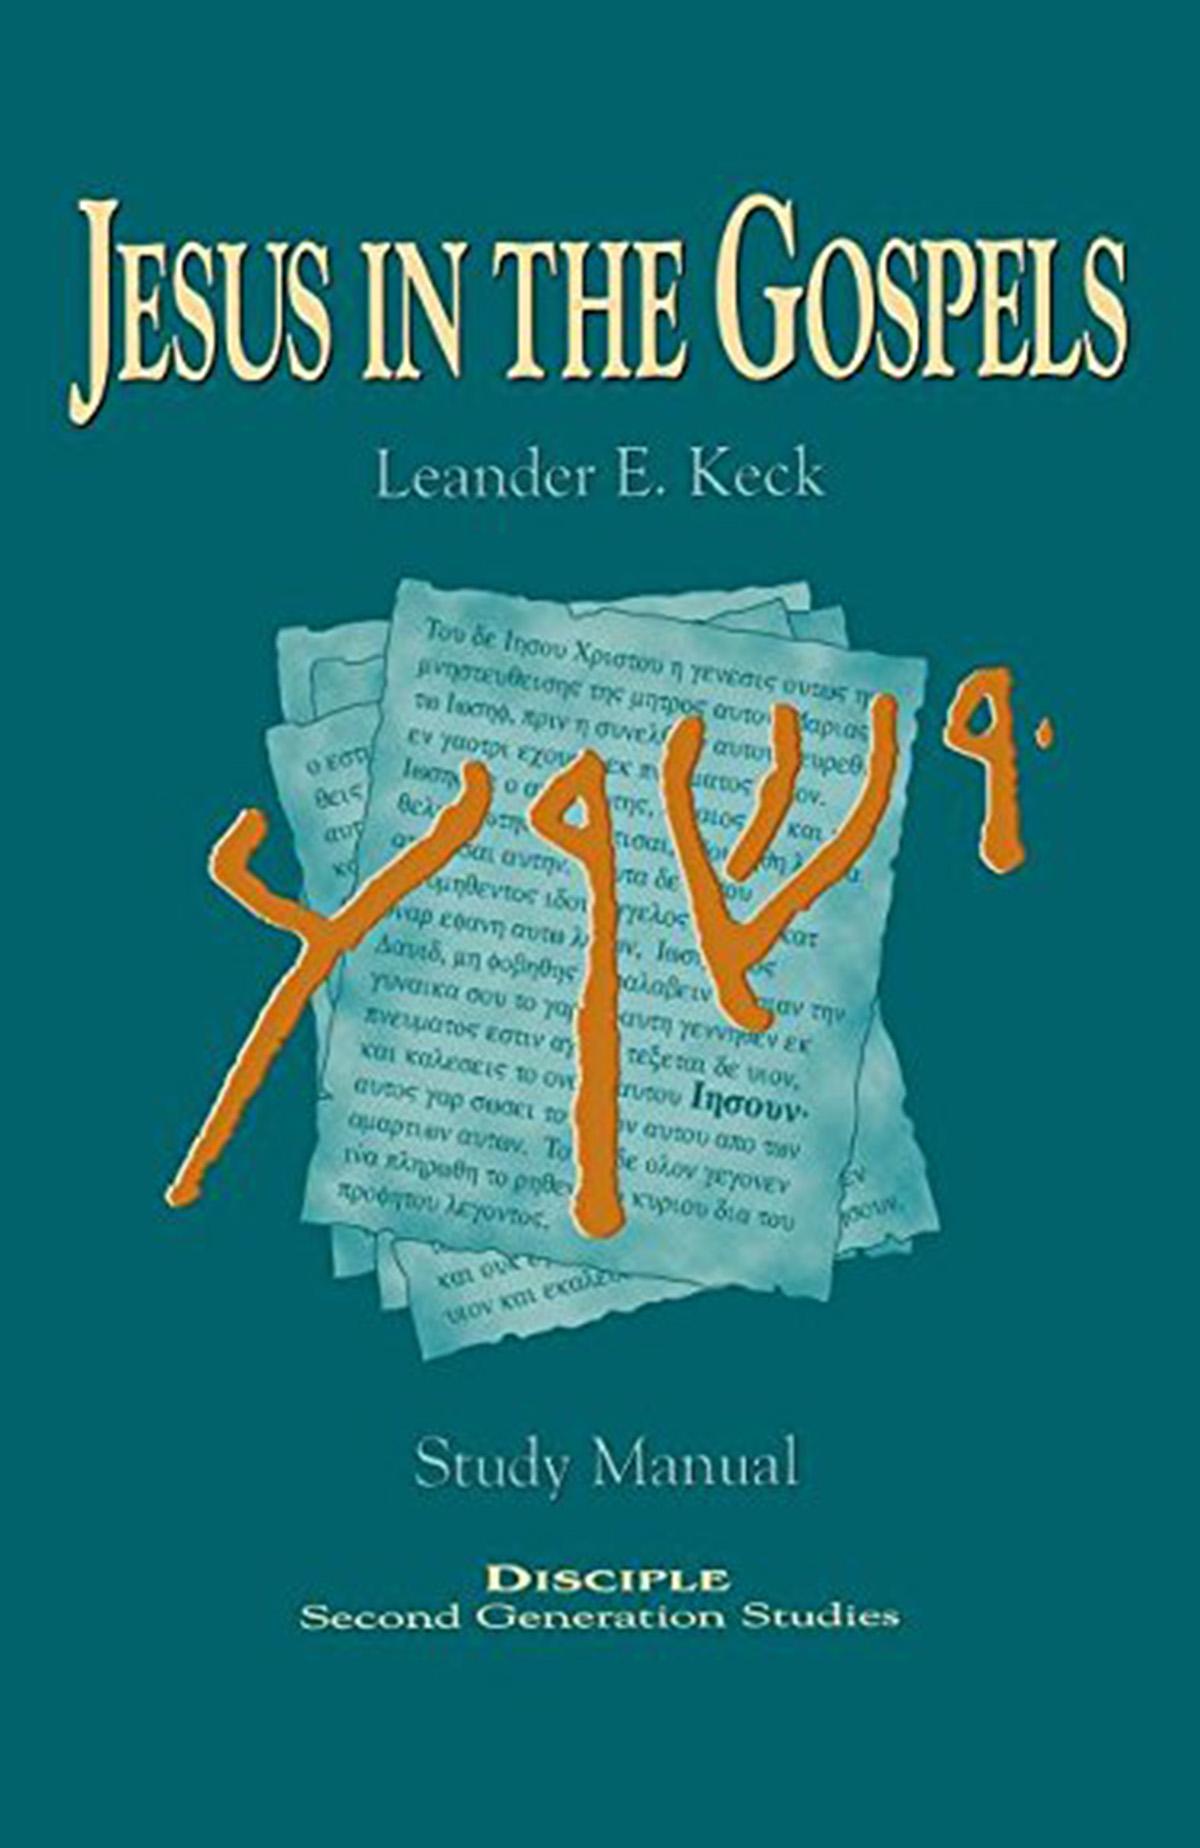 jesus in the gospel